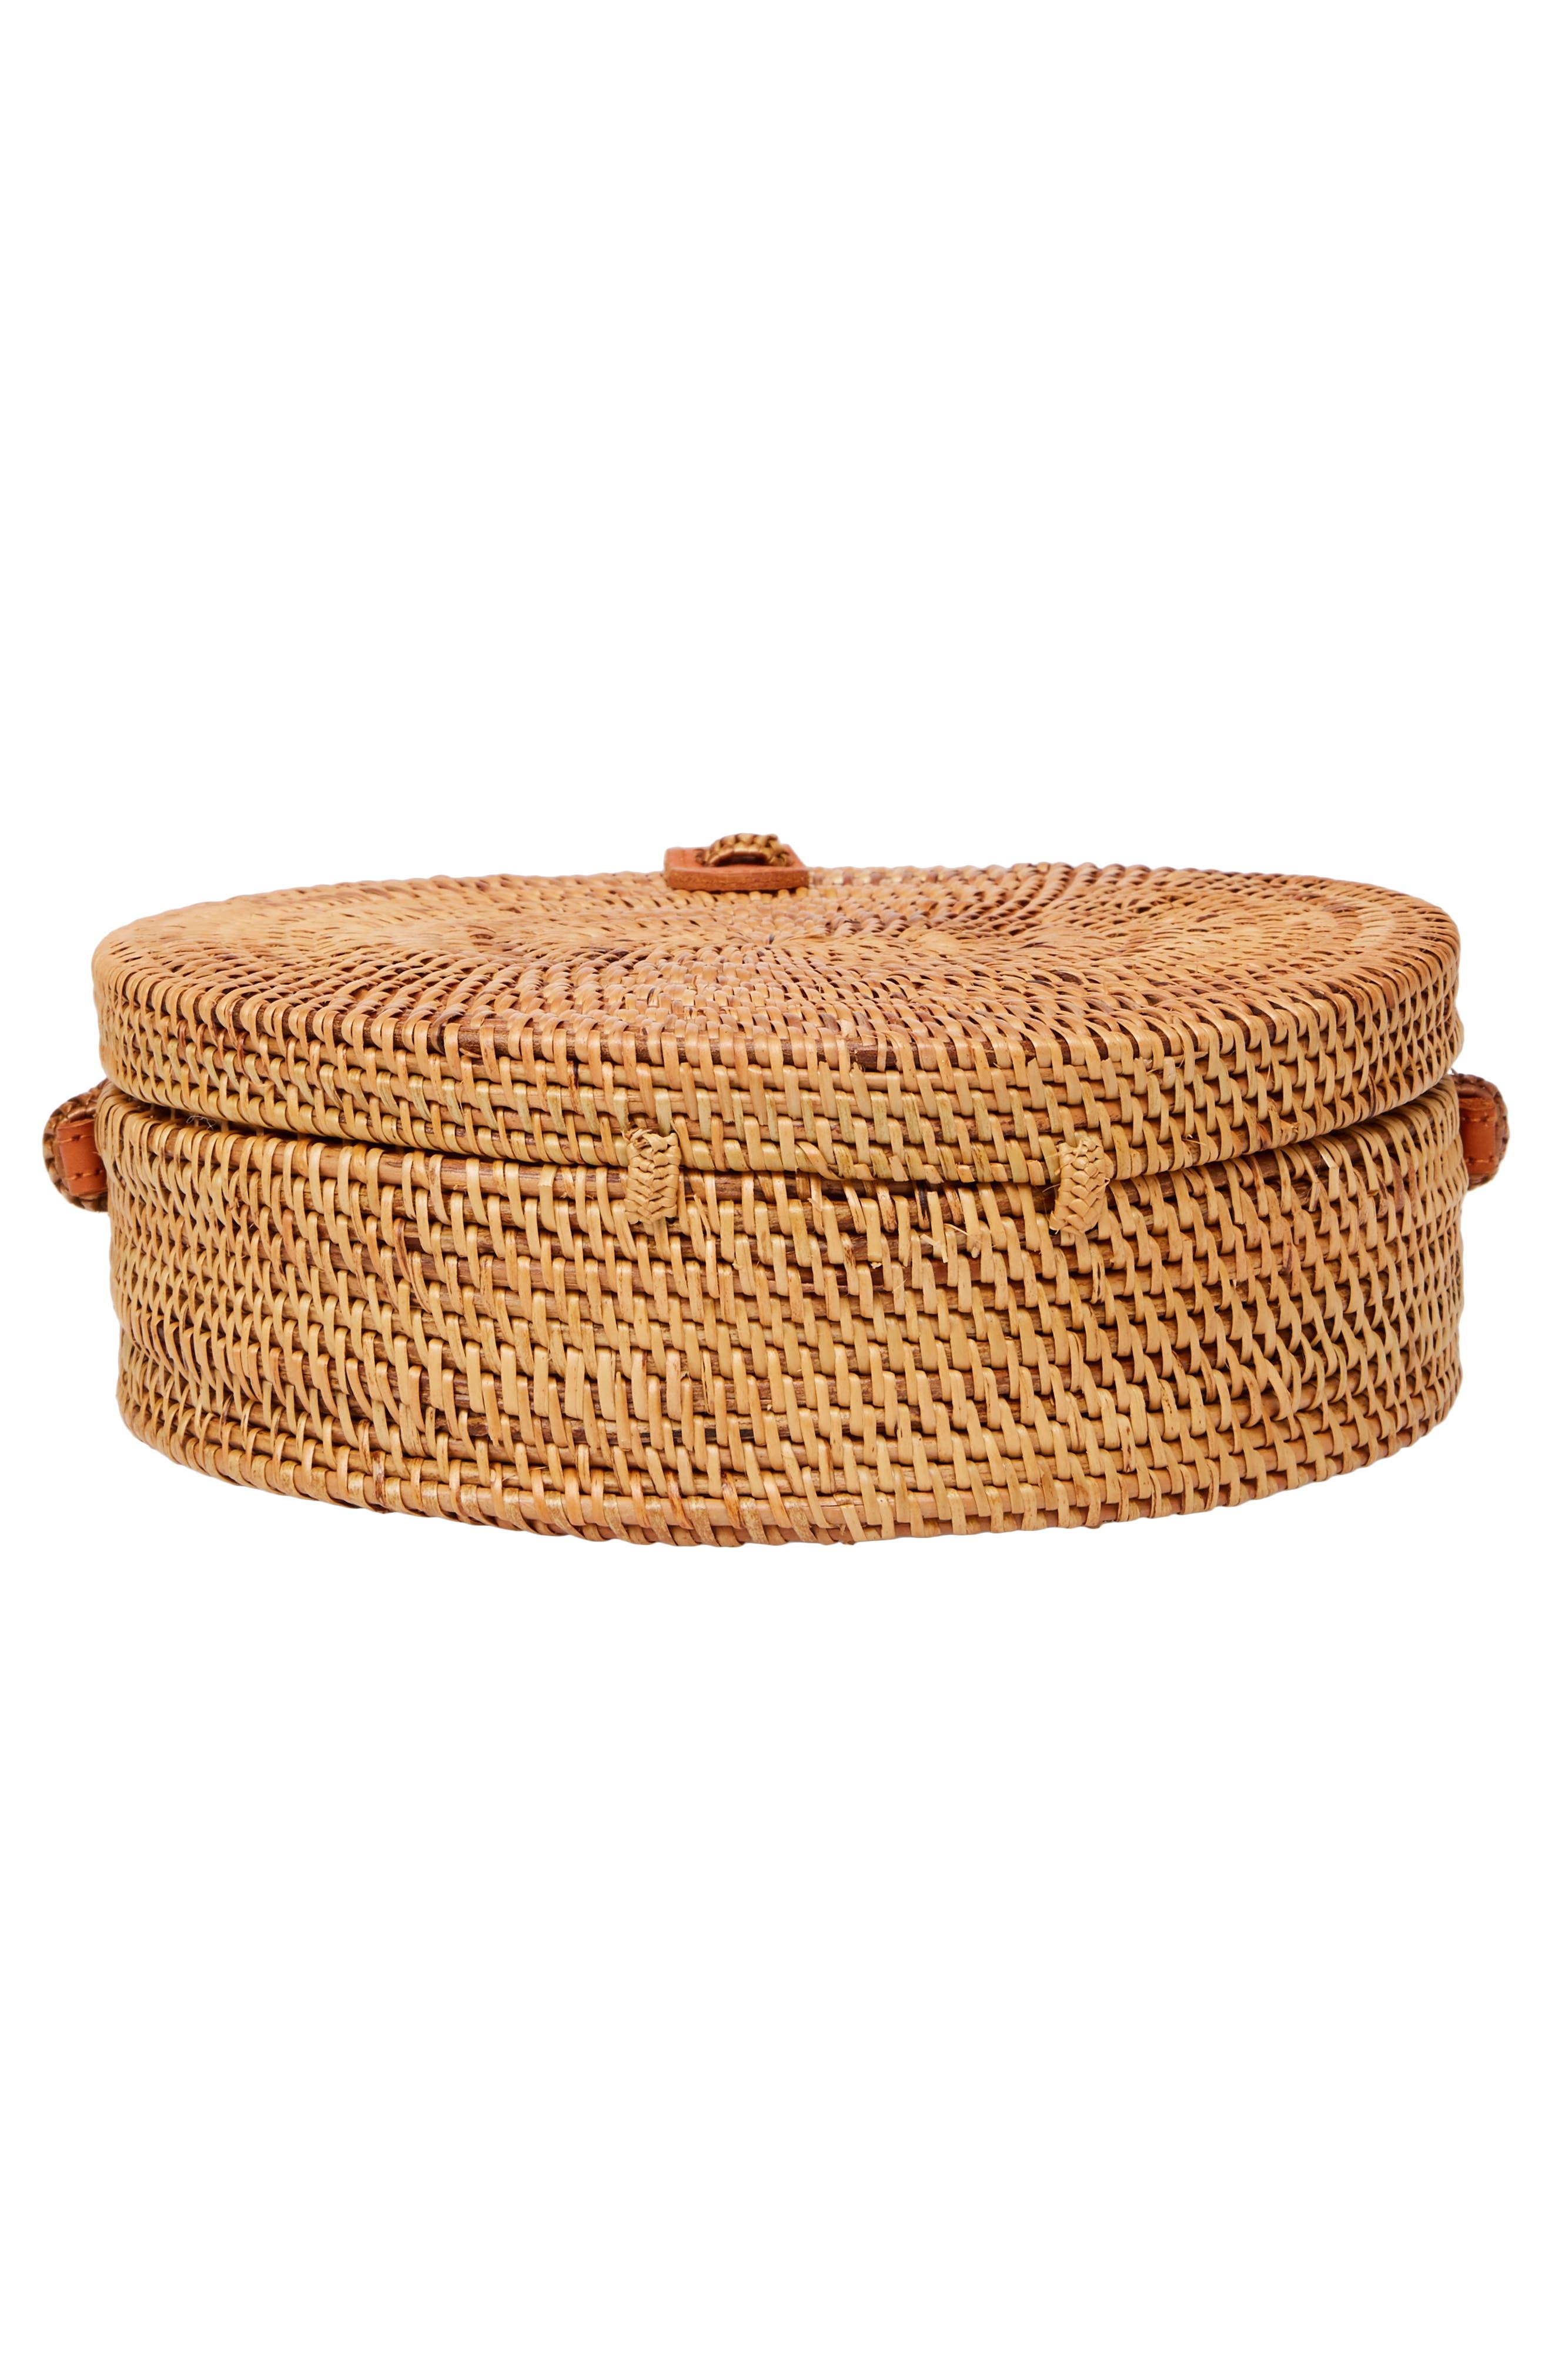 Woven Rattan Circle Basket Crossbody,                             Alternate thumbnail 6, color,                             Tan